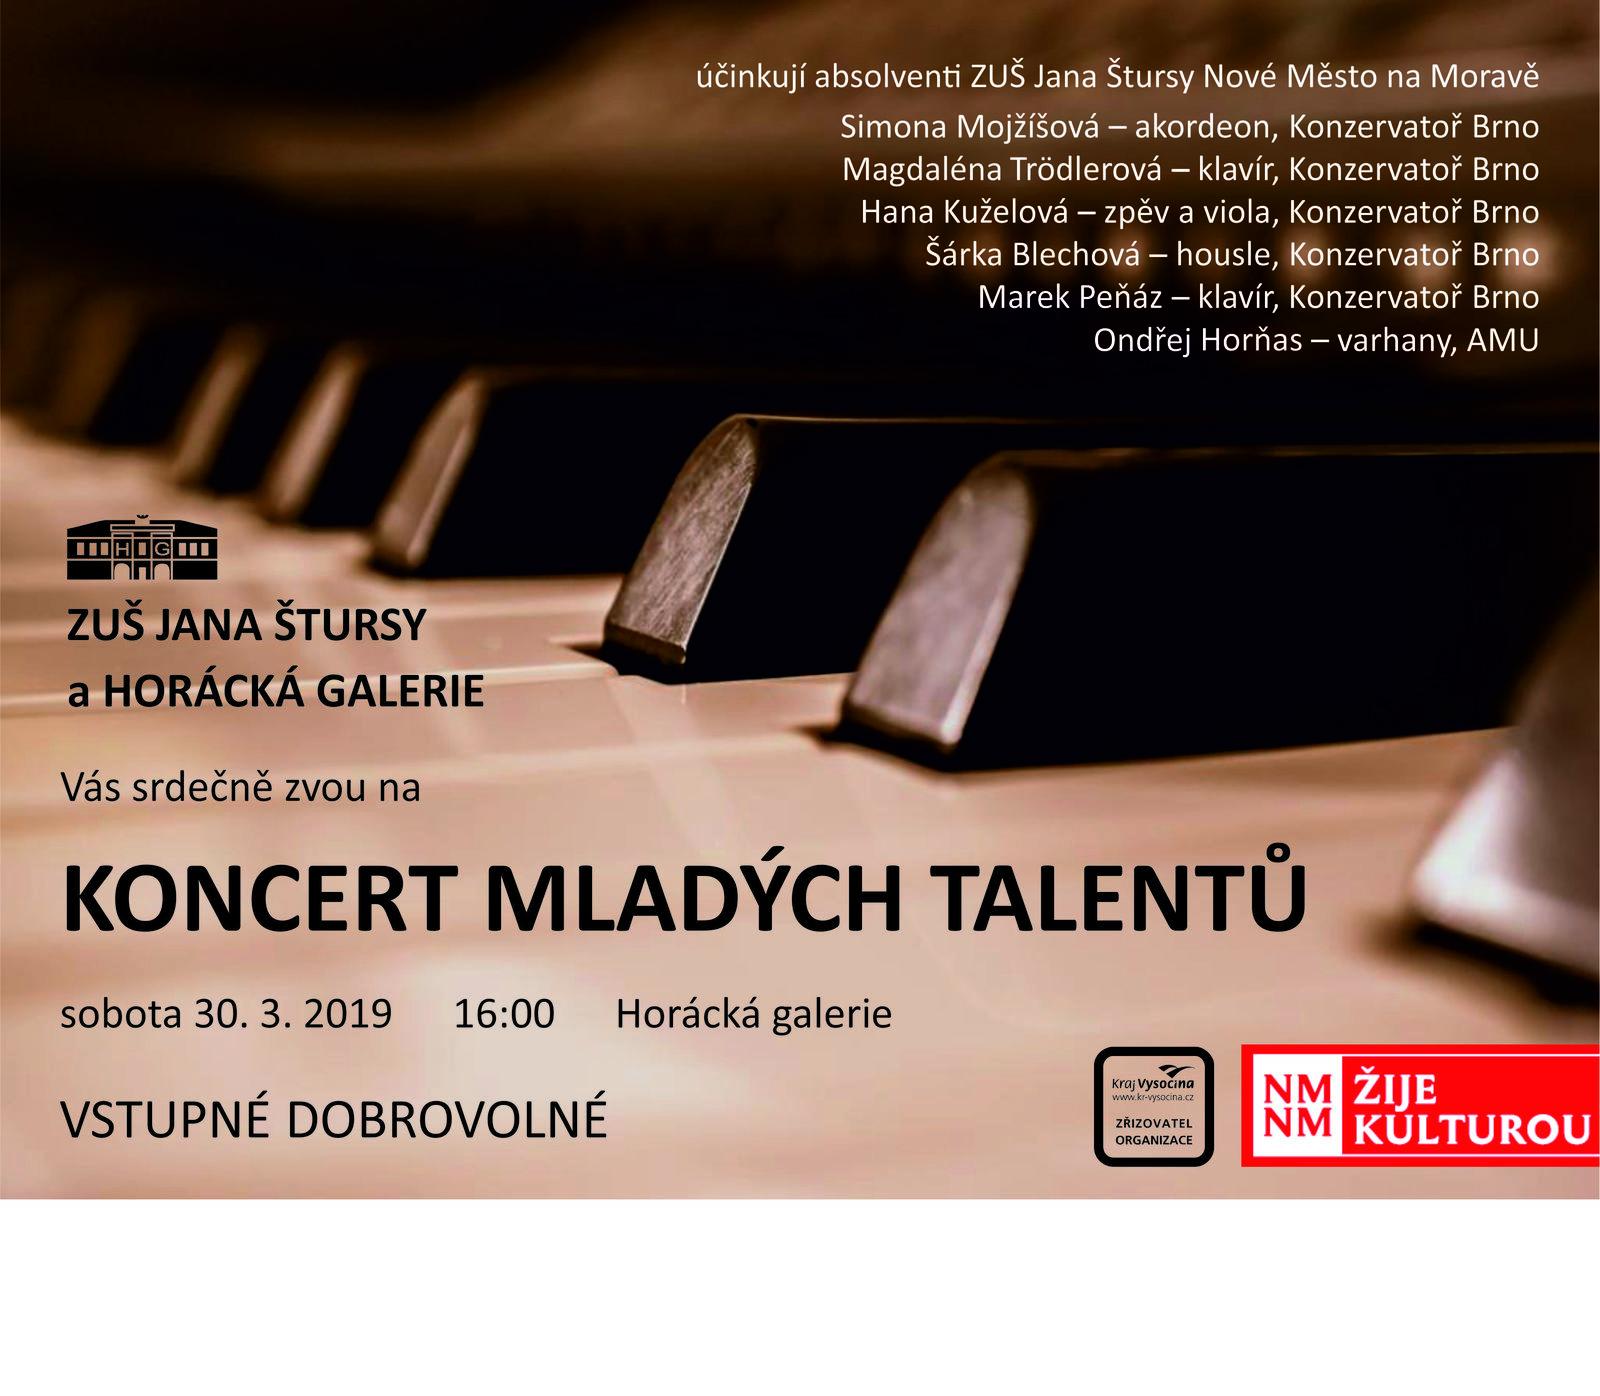 koncert mladých talentů.jpg